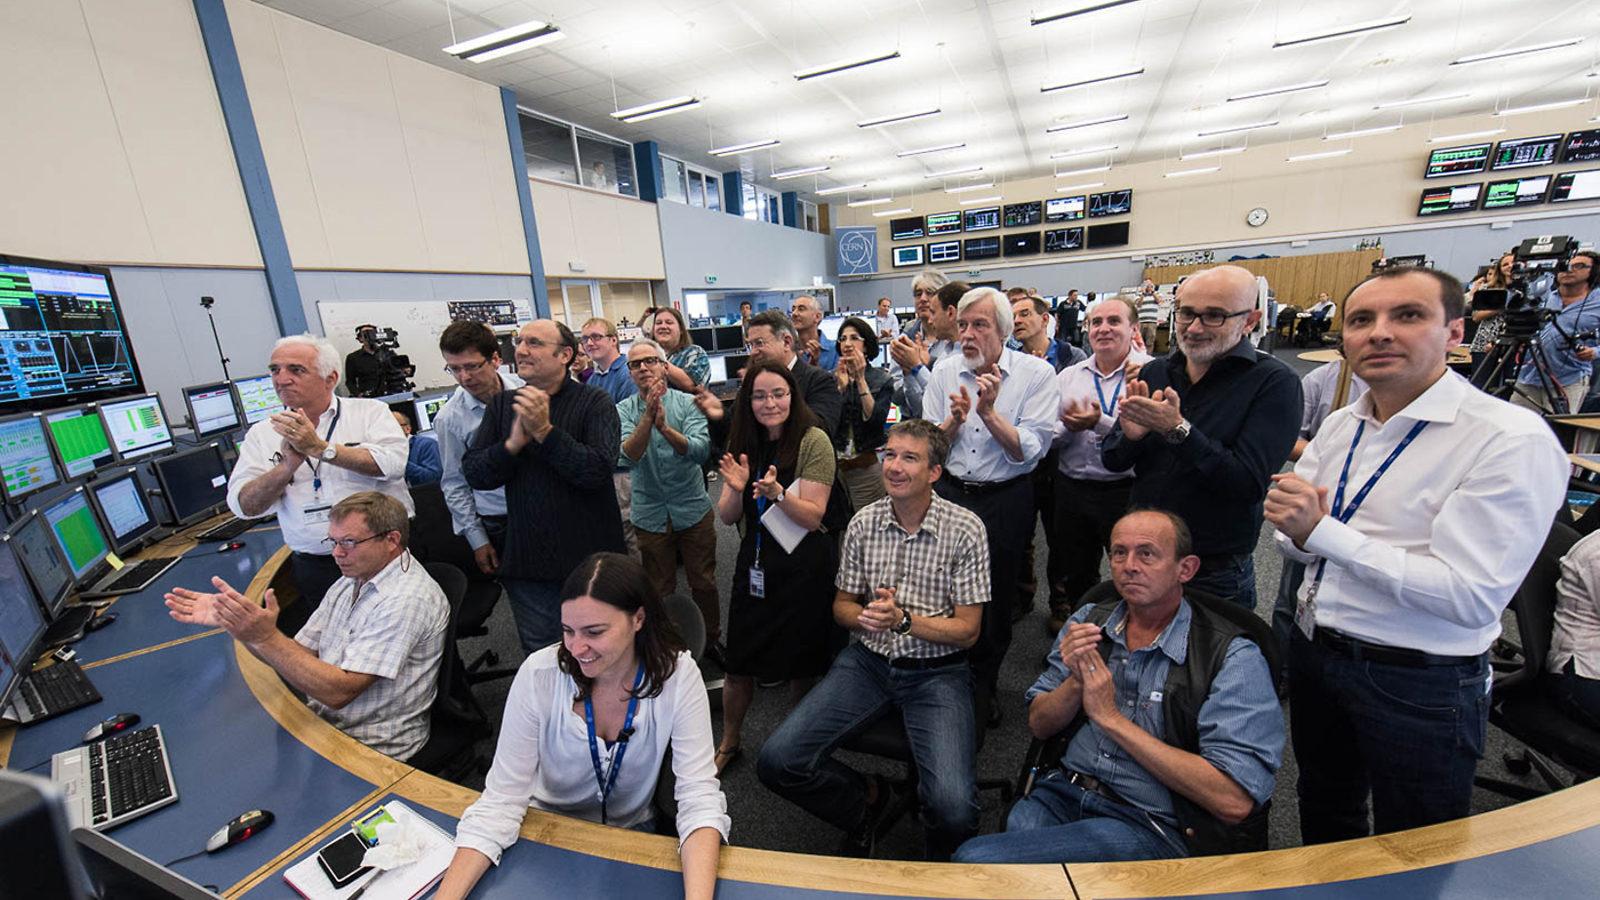 Photo: 13 TeV applause